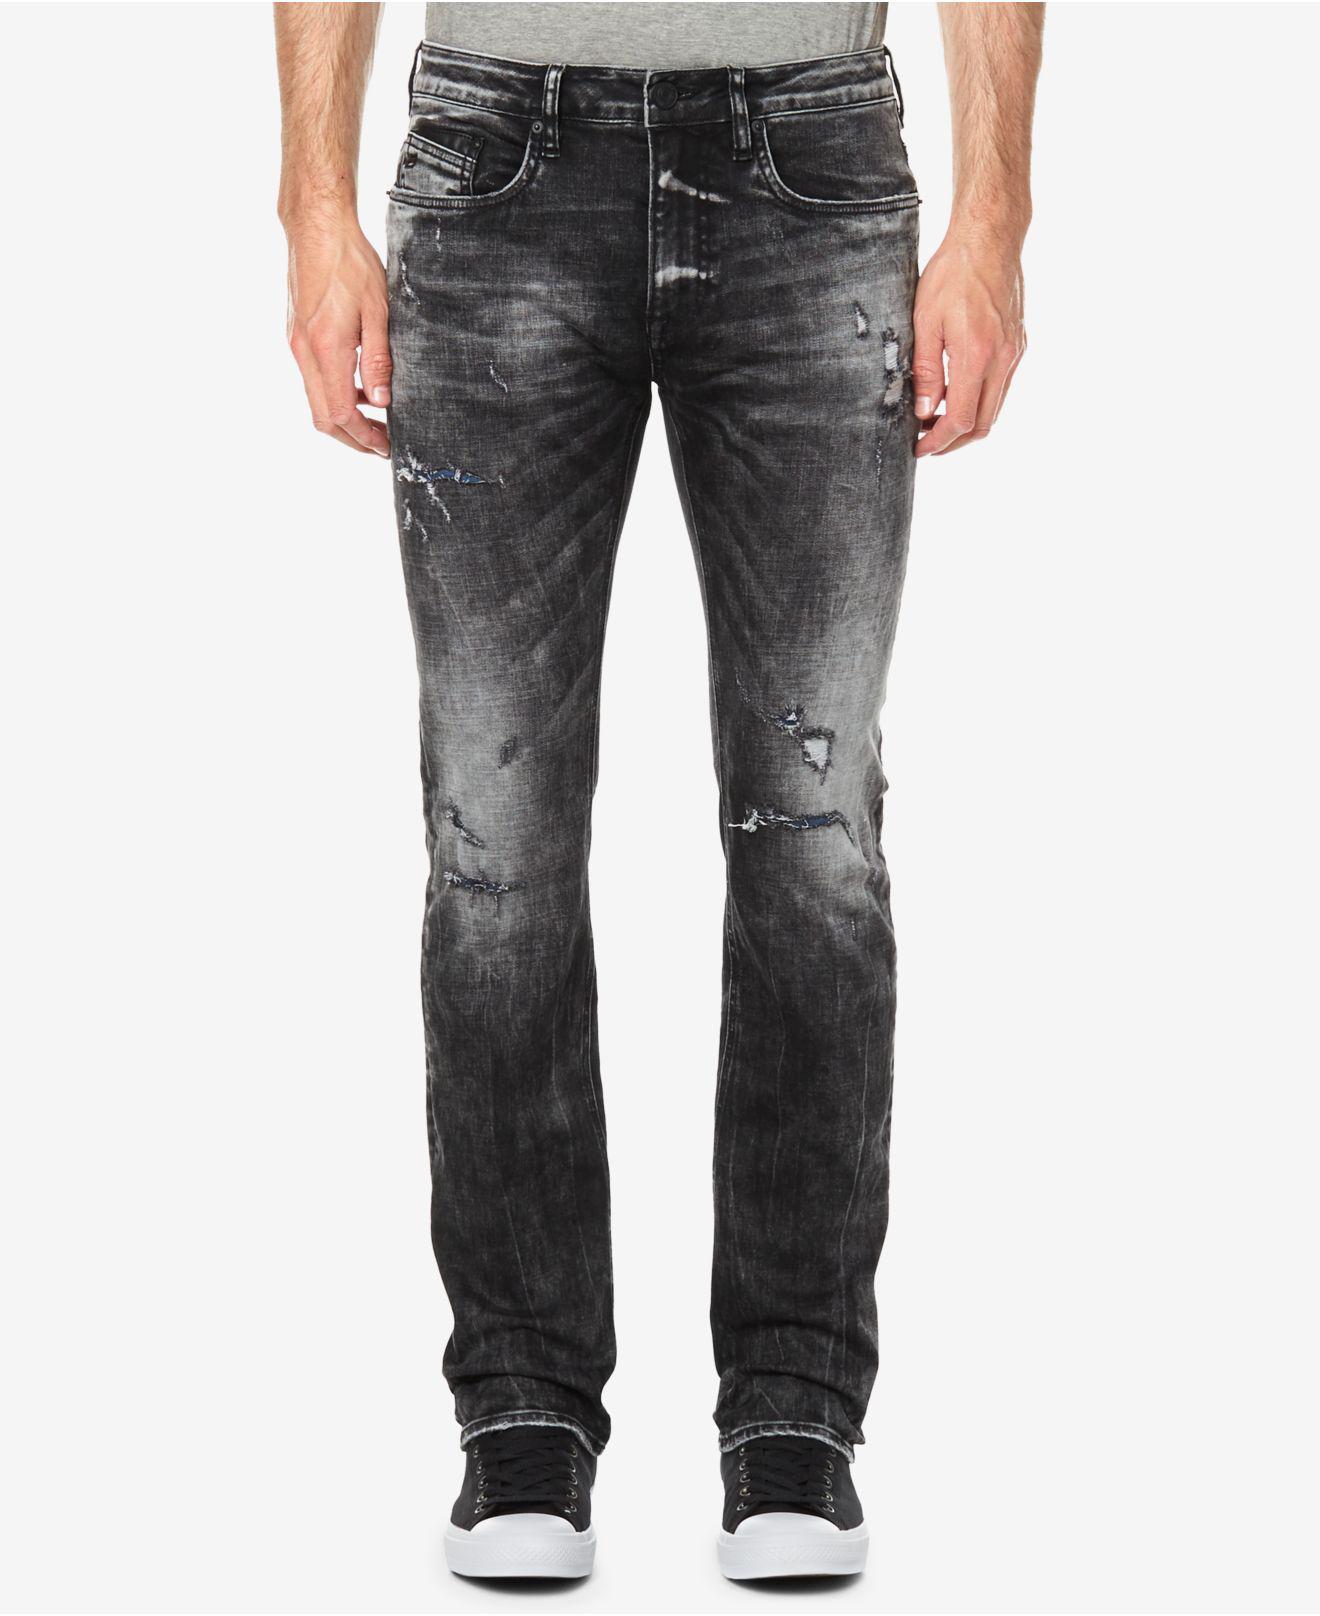 Buffalo Mens Six-X Basic Jeans Slim Straight Stretch Distressed Destroyed Worn